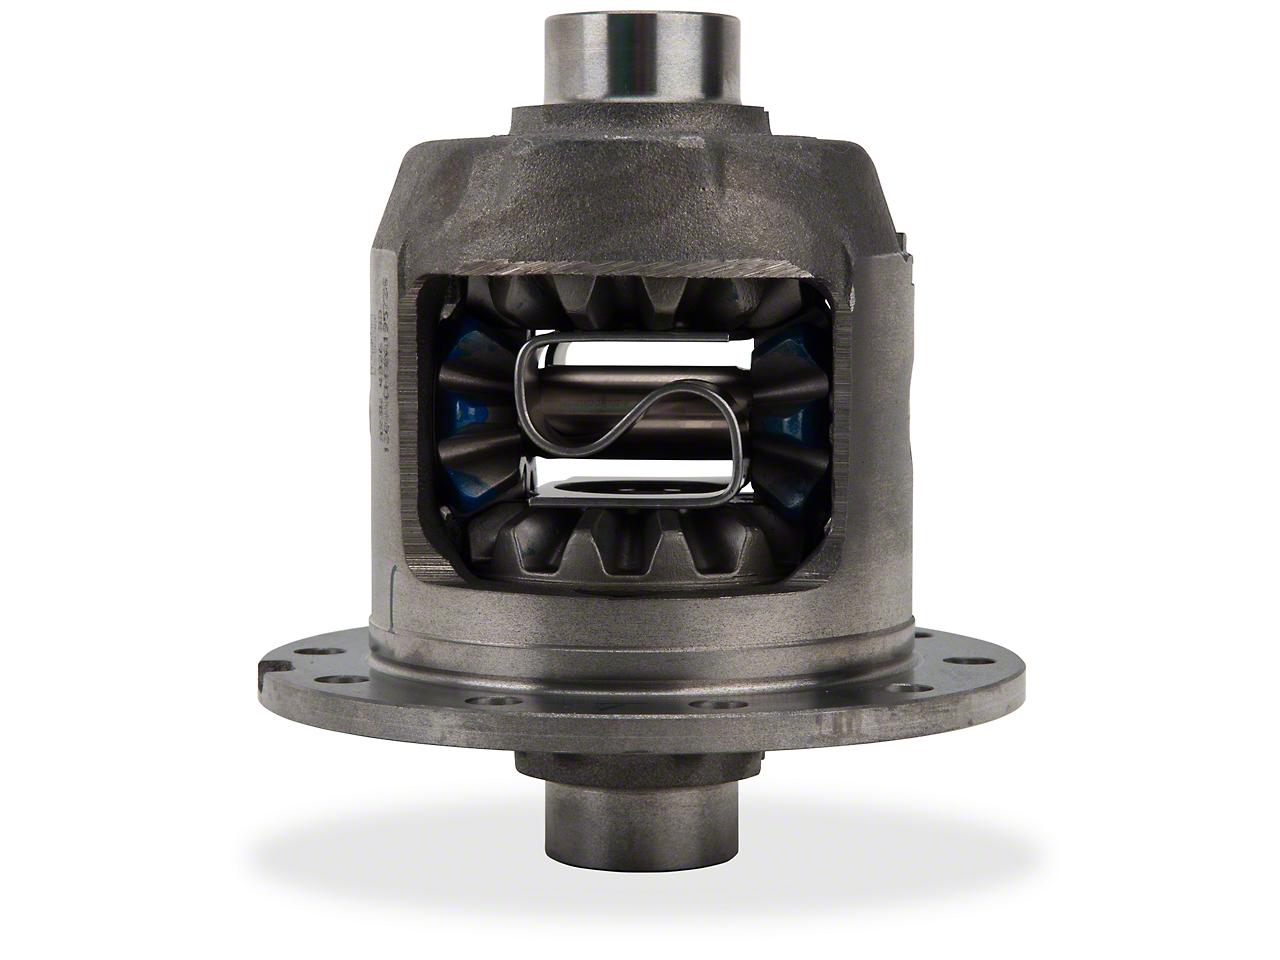 Ford Performance Traction - LOK Limited Slip Differential w/ Carbon Discs - 31 Spline 8.8 in. (86-14 V8; 11-14 V6)